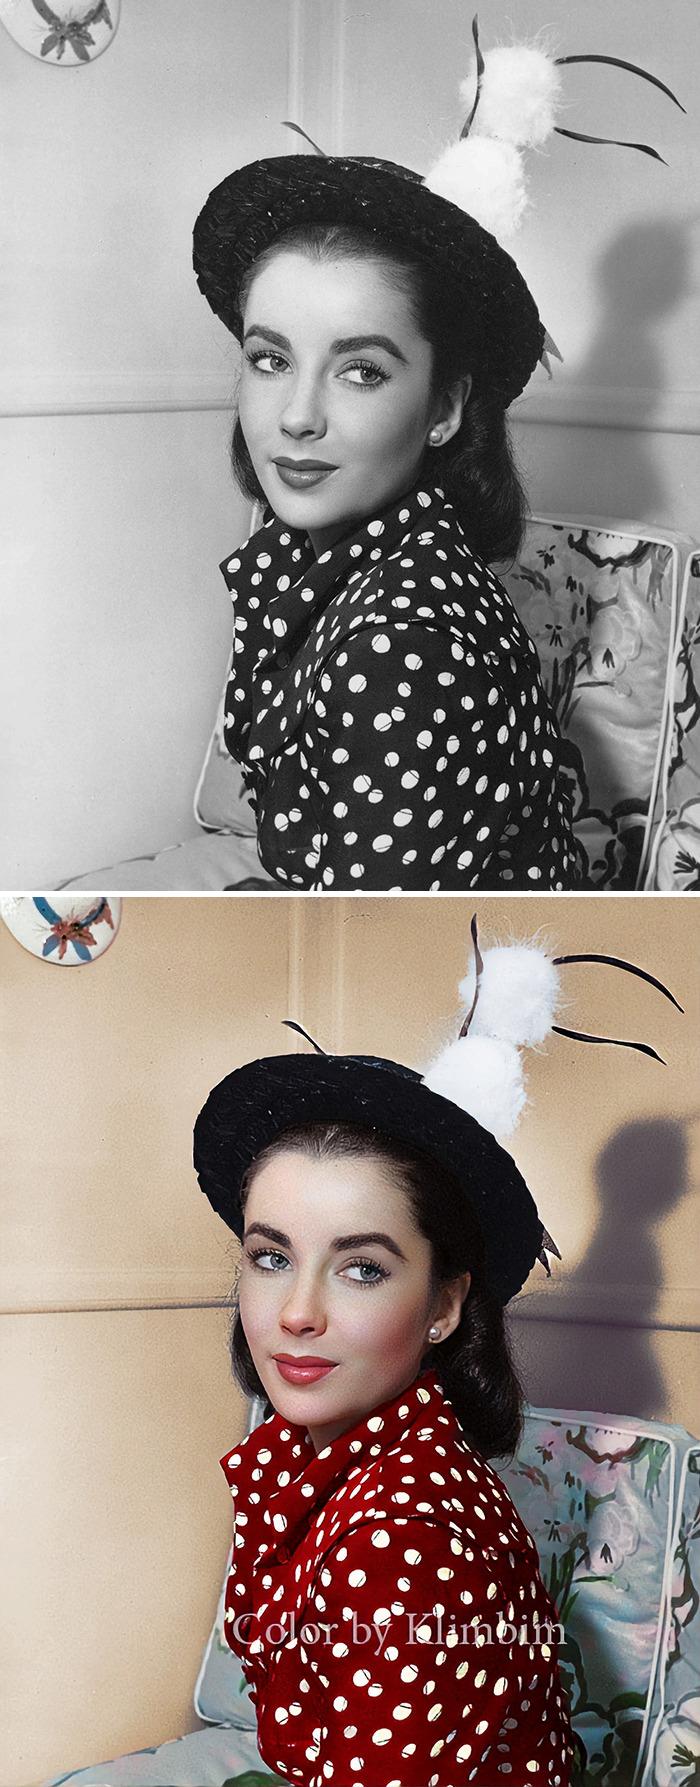 5e69f0bf3f636 This Russian artist impresses by giving vivid colors to photos of celebrities from the past 5e679b1a426ed png  700 - Fotos antigas coloridas de estrelas clássicas de Hollywood